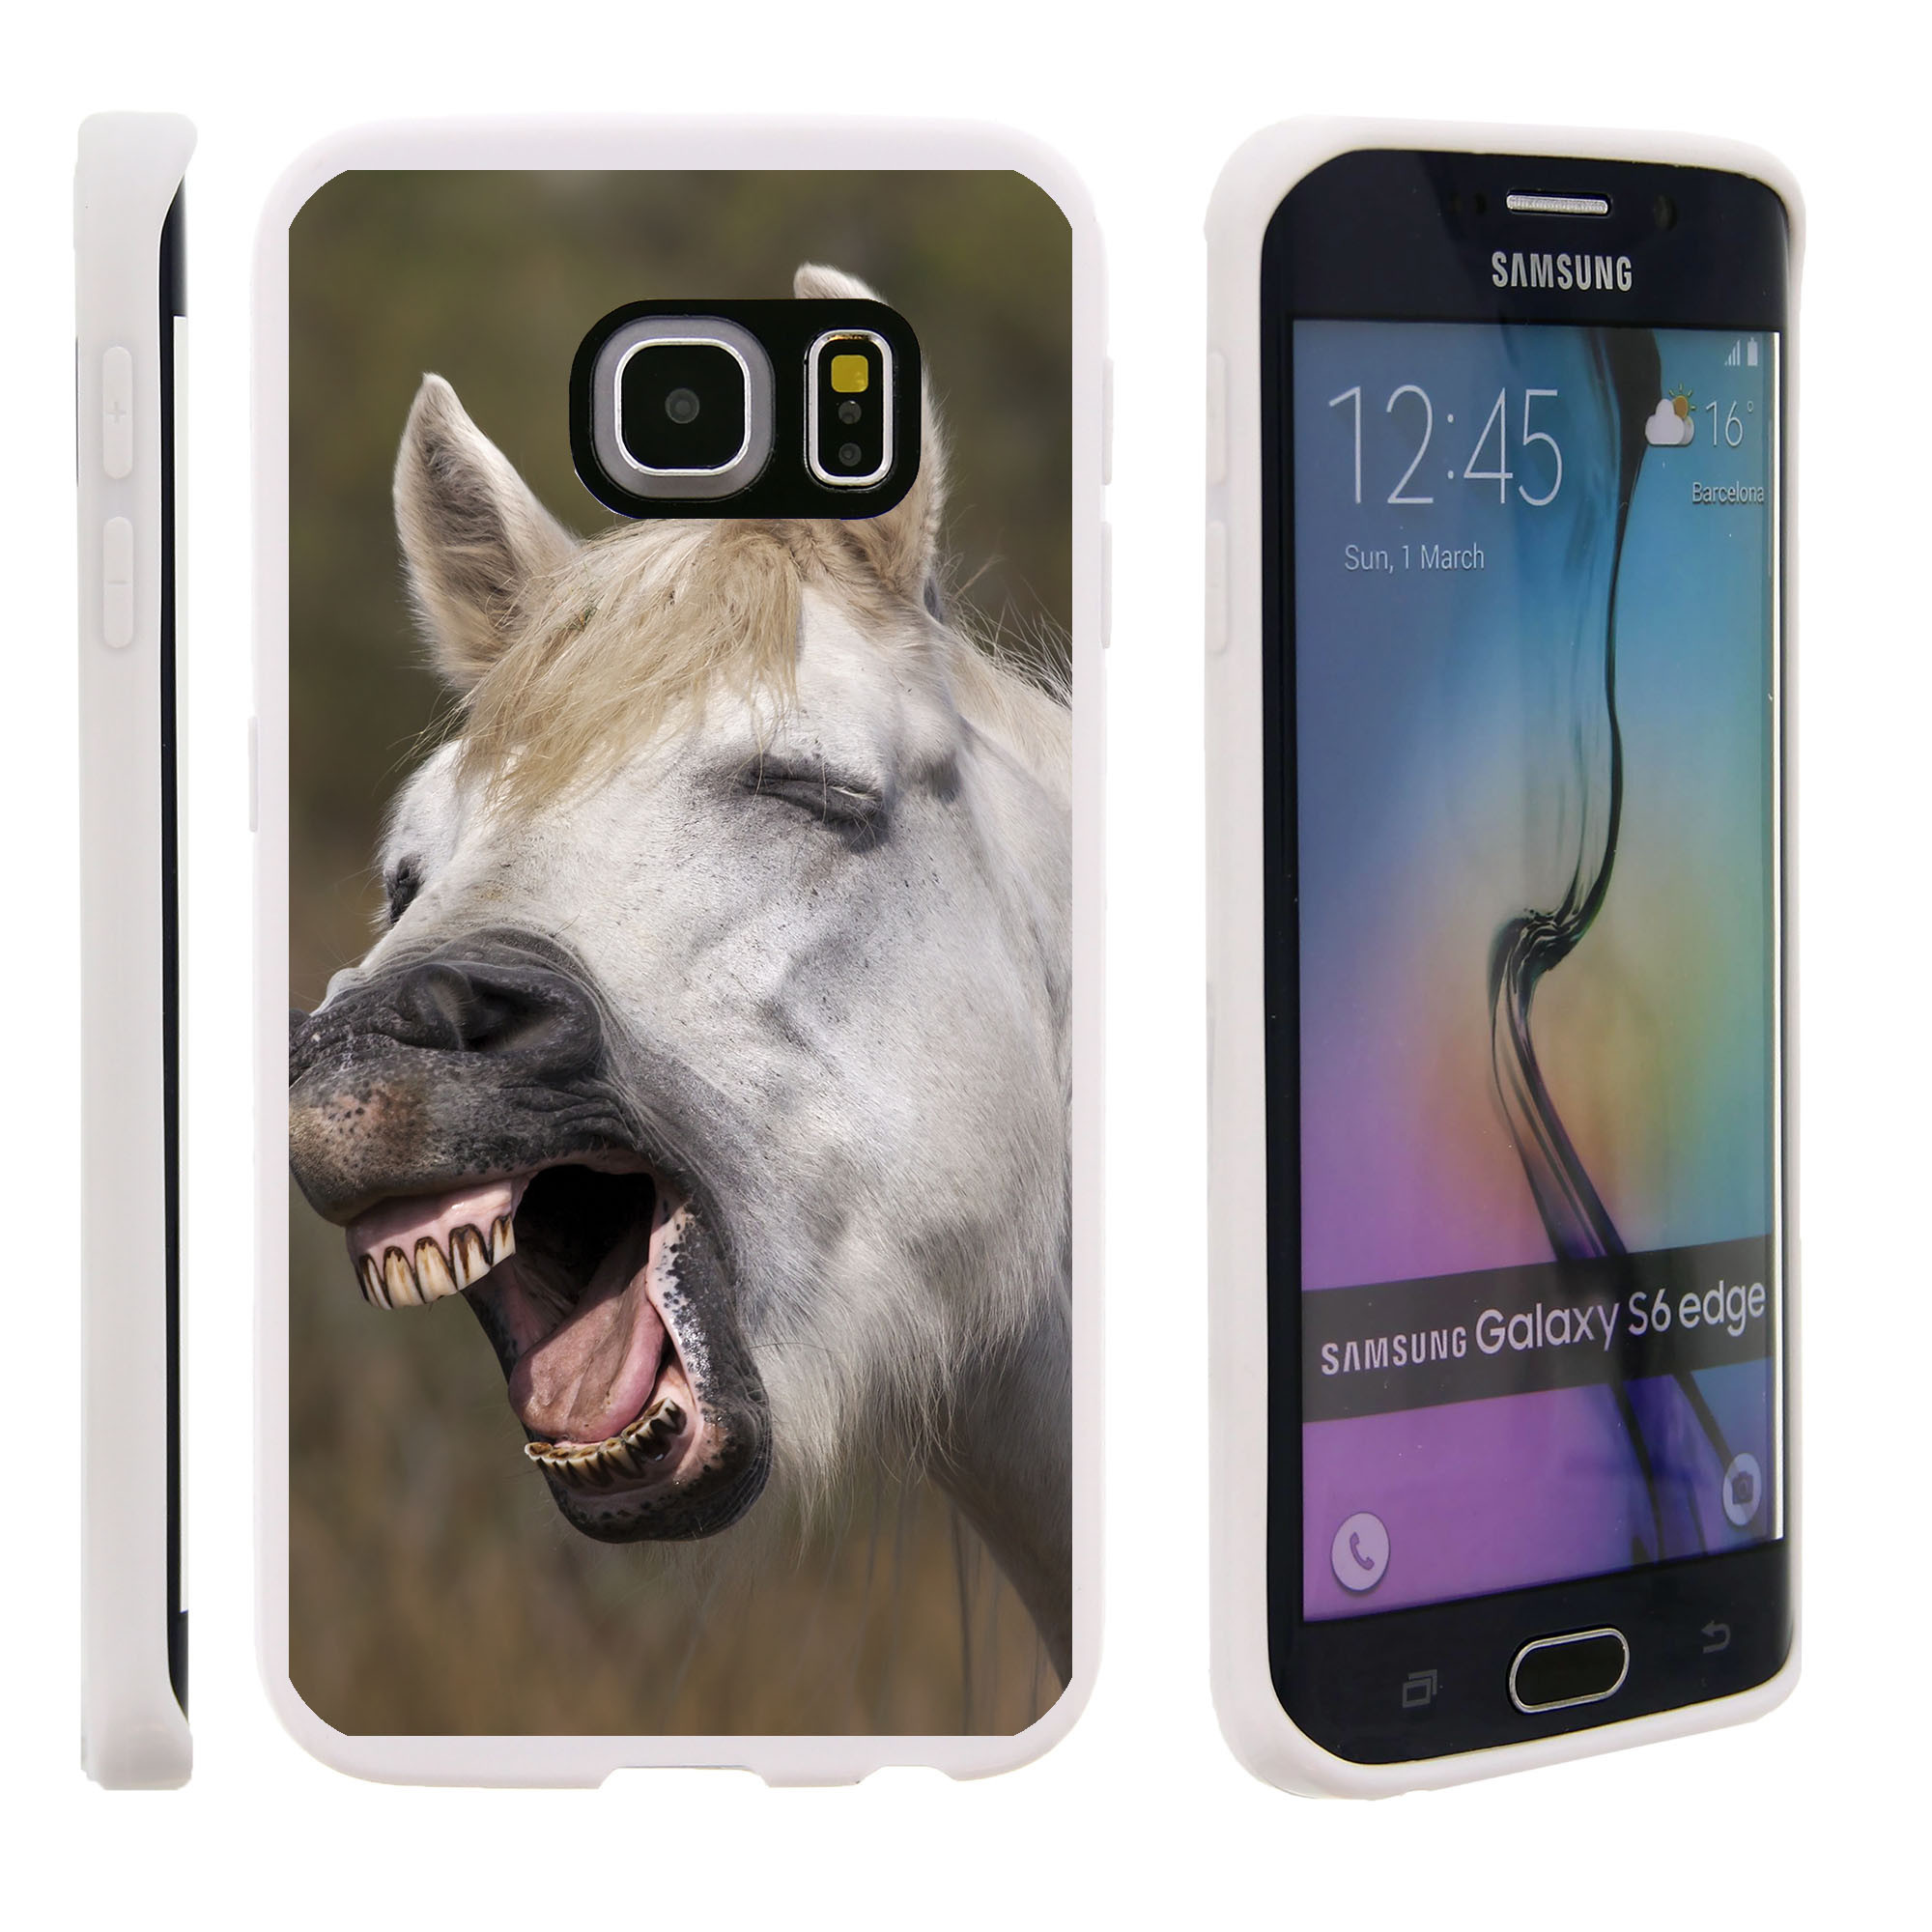 Samsung Galaxy S6 Edge G925, Flexible Case [FLEX FORCE] Slim Durable TPU Sleek Bumper with Unique Designs - Tired Donkey